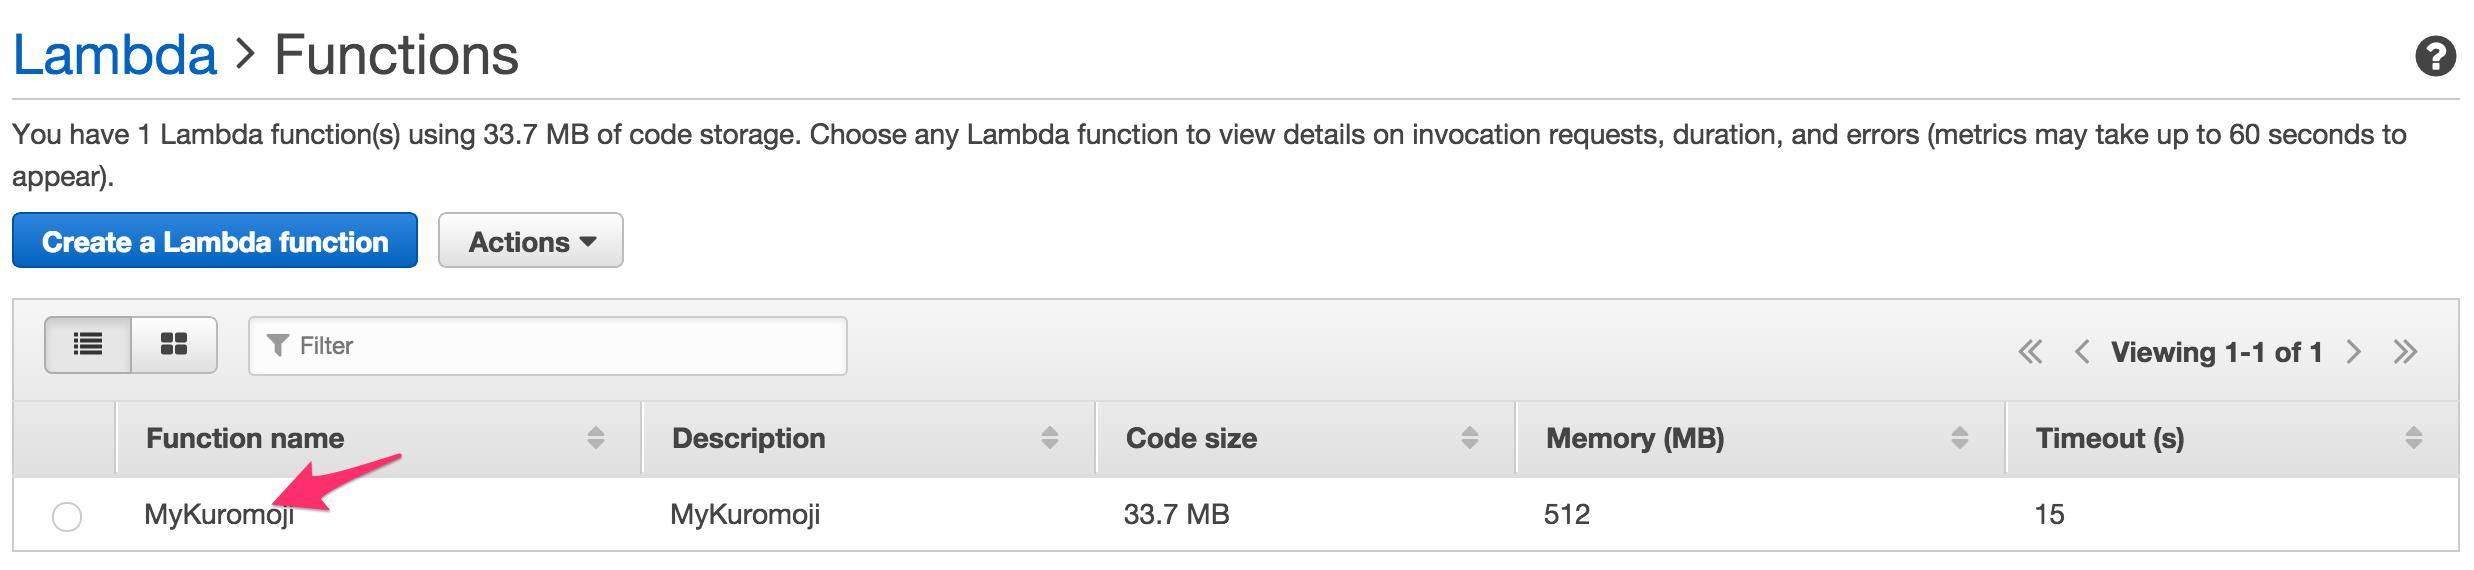 lambda010.png